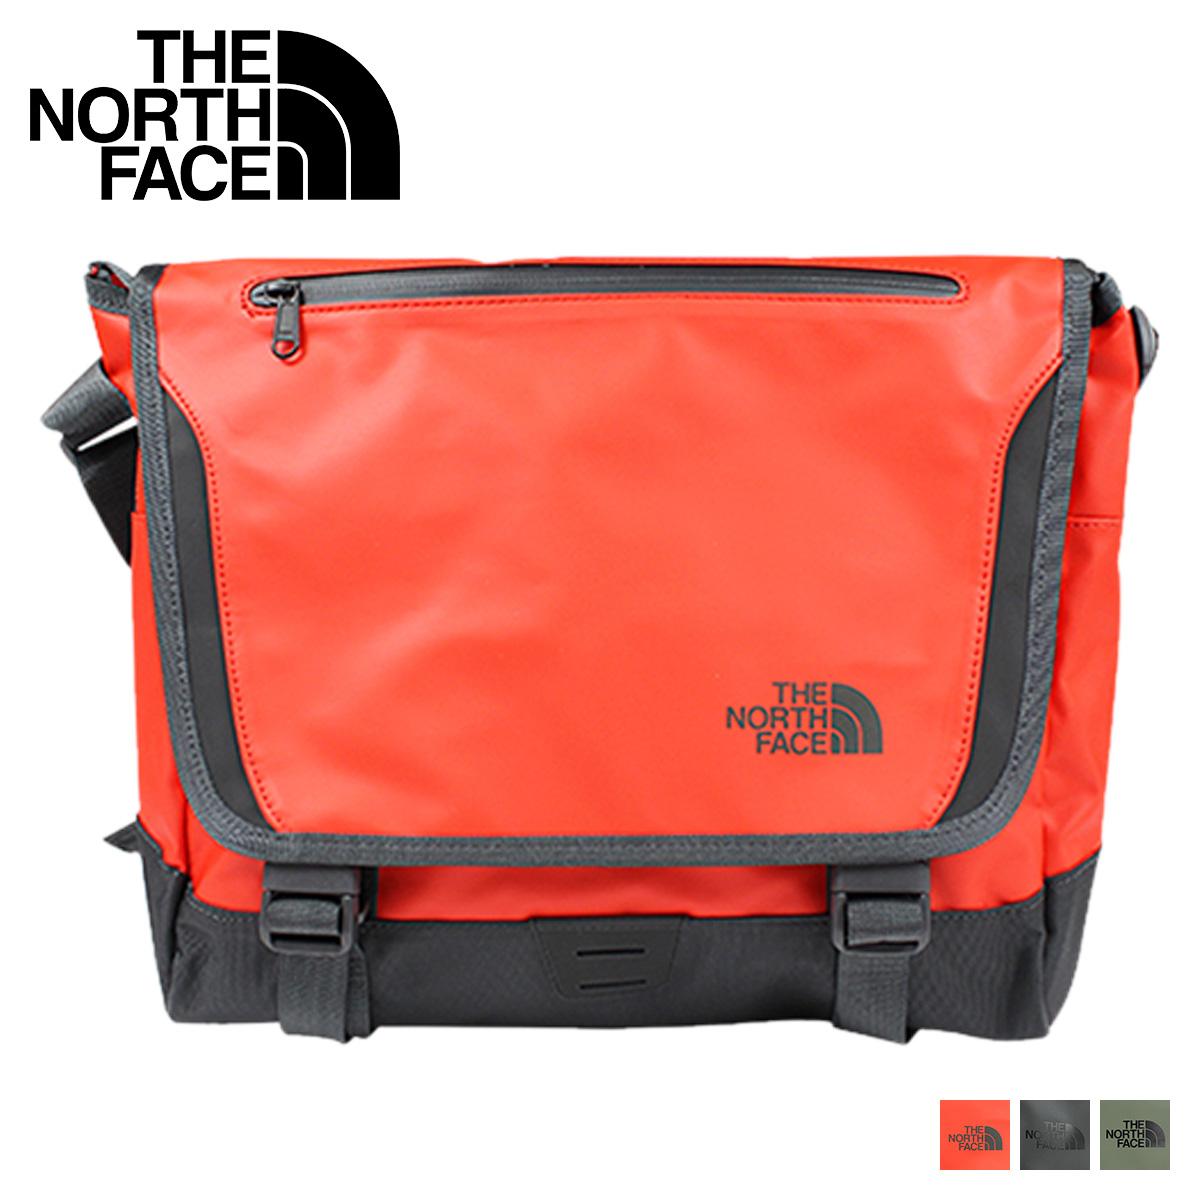 Whats Up Sports Sold Out ザノースフェイス The North Face Messenger Bag Shoulder A6sa 3 Color Base Camp S Men Rakuten Global Market